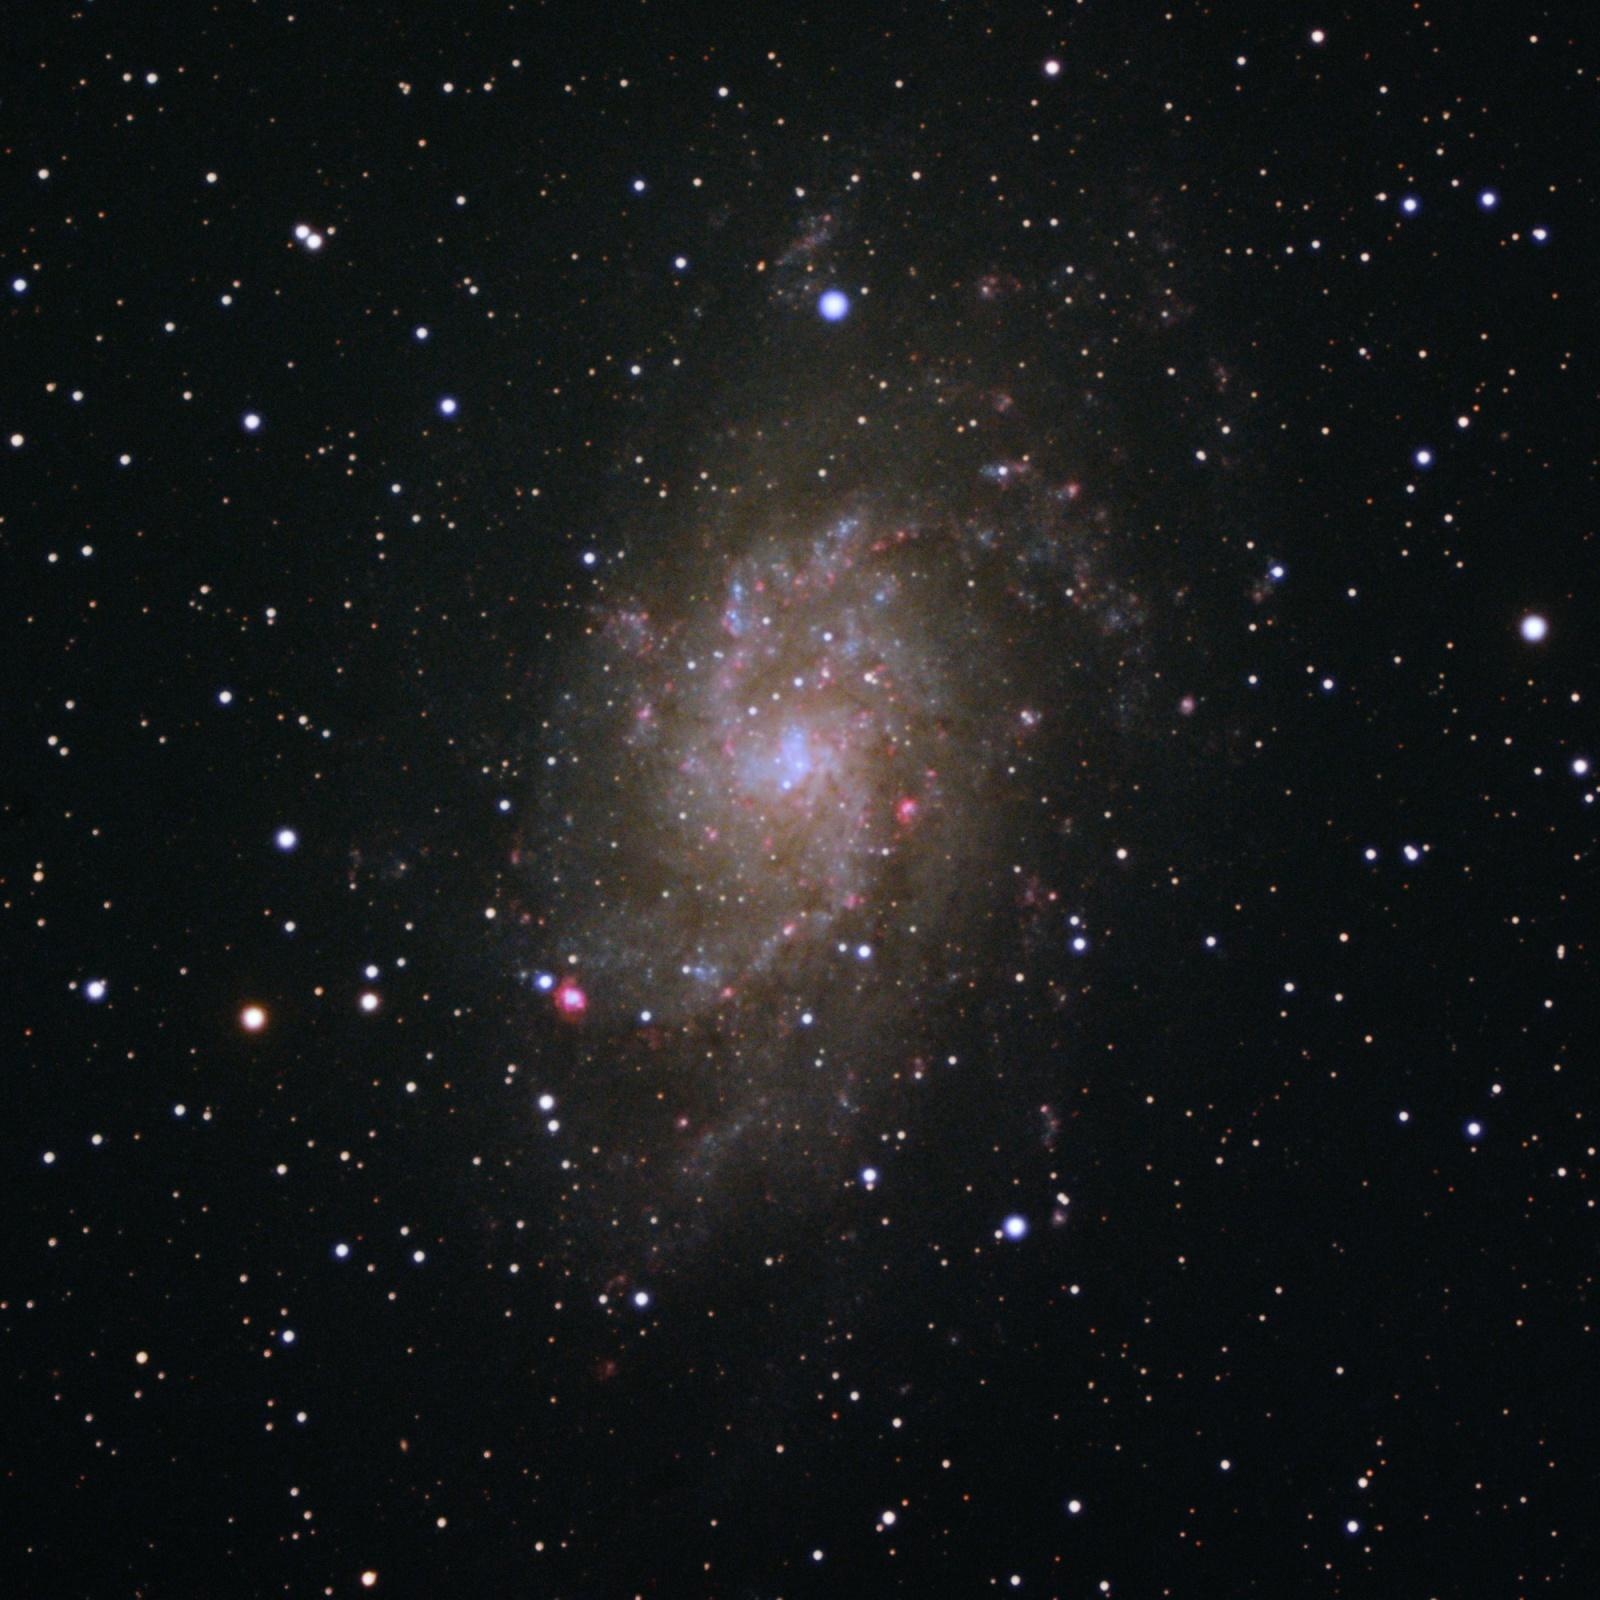 M33_v3_crop.thumb.jpg.44e8e5ca48957d1ca5e332f684ac6cea.jpg